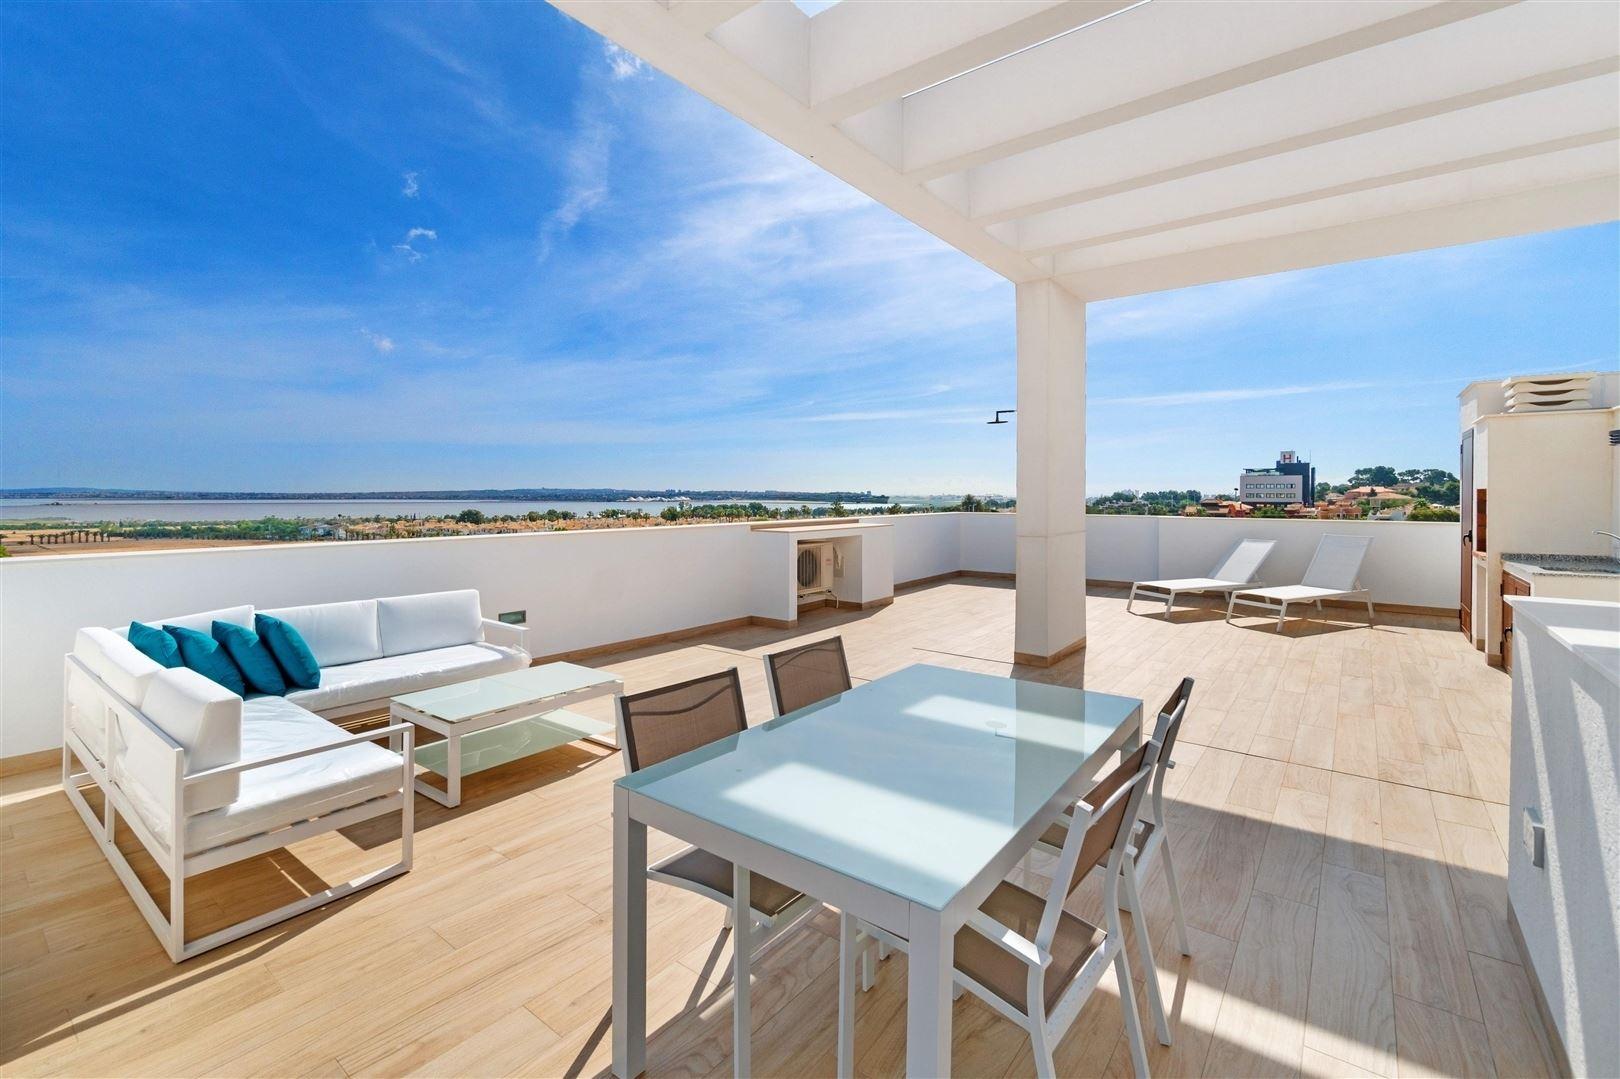 Foto 1 : Appartement te   (Spanje) - Prijs € 169.900